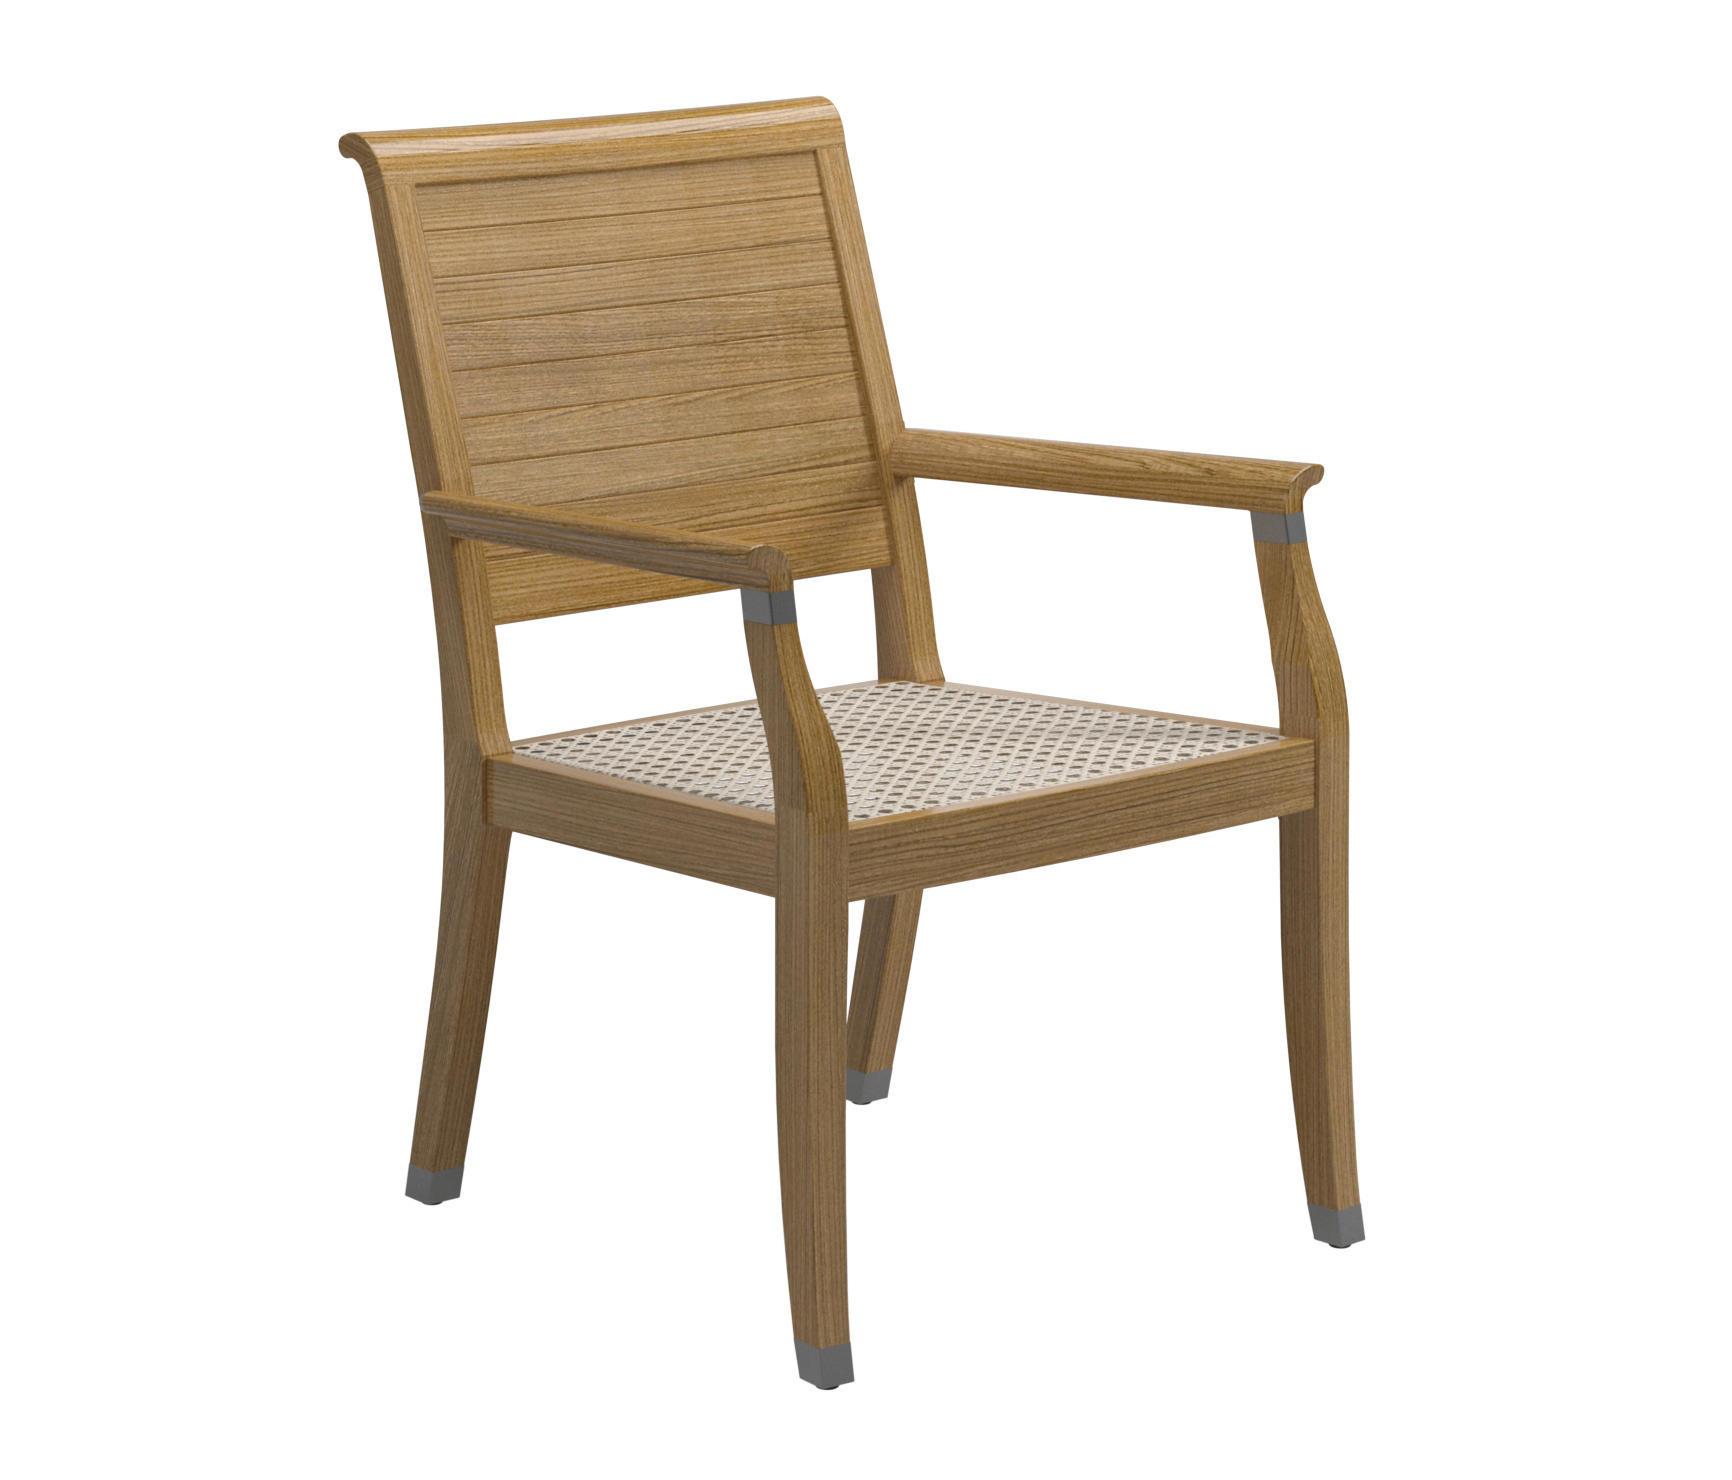 Gloster Chaises Arlington De GmbhArchitonic Chair Furniture cA453RqjL